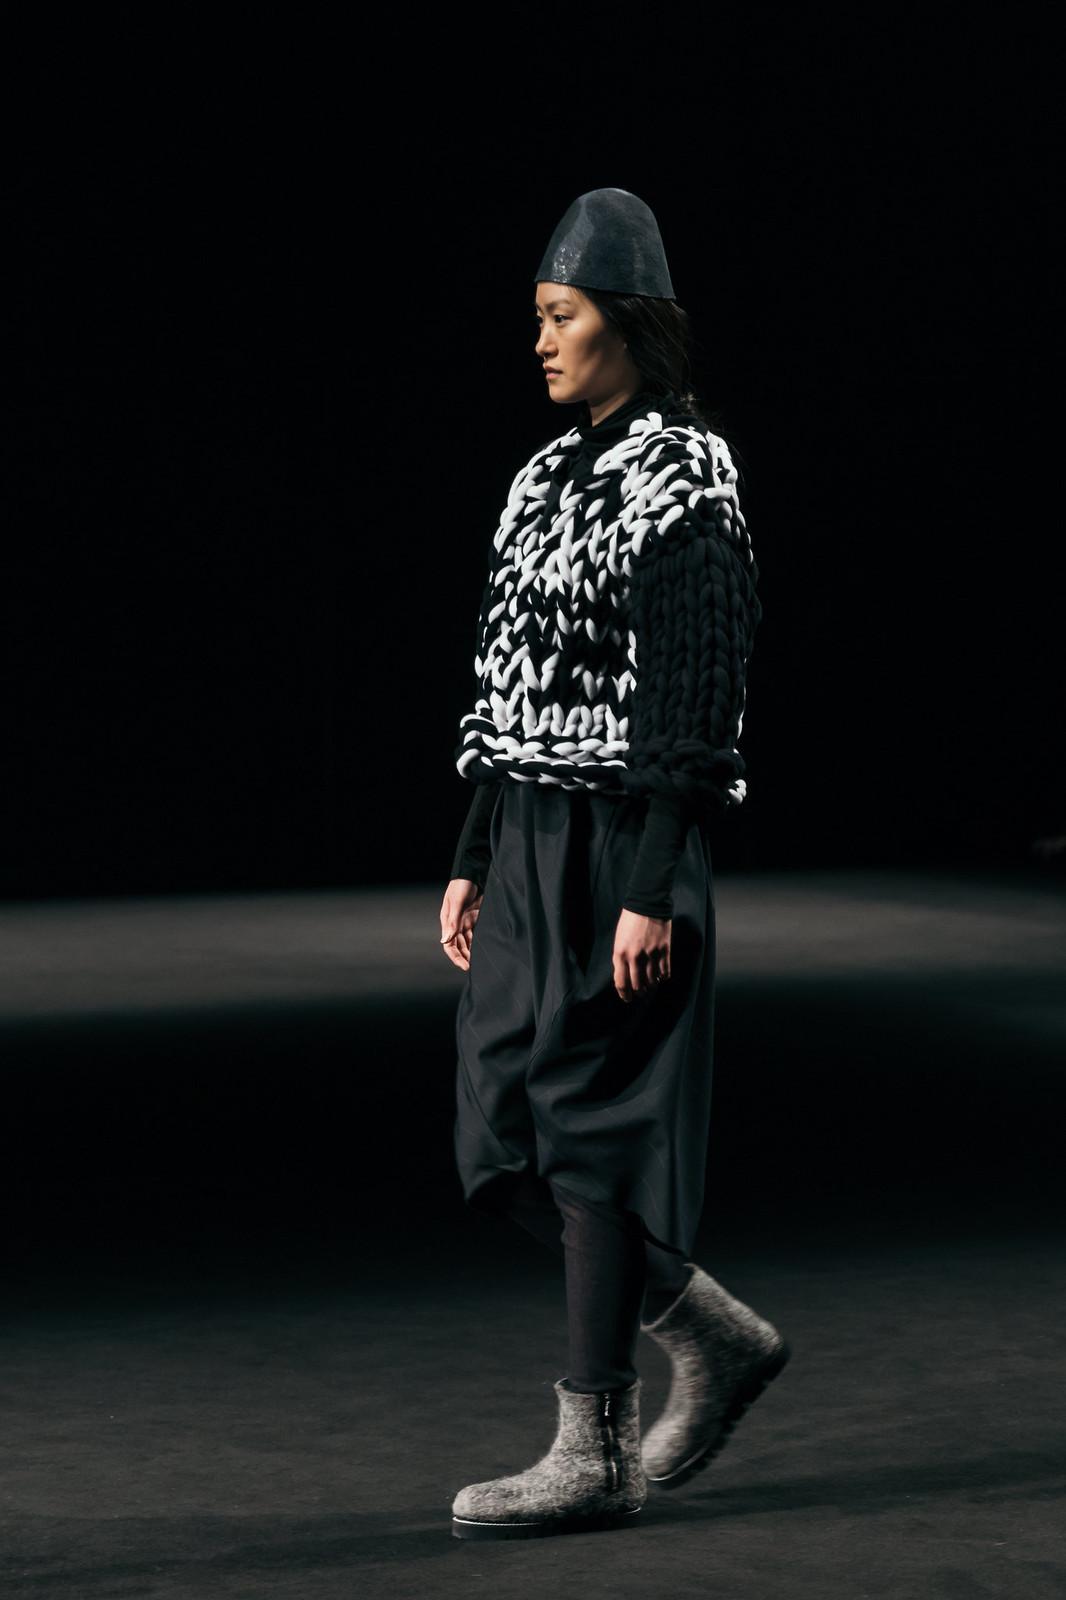 Jessie Chanes - Seams for a desire - 080 Bacelona Fashion #080bcnfasion -30